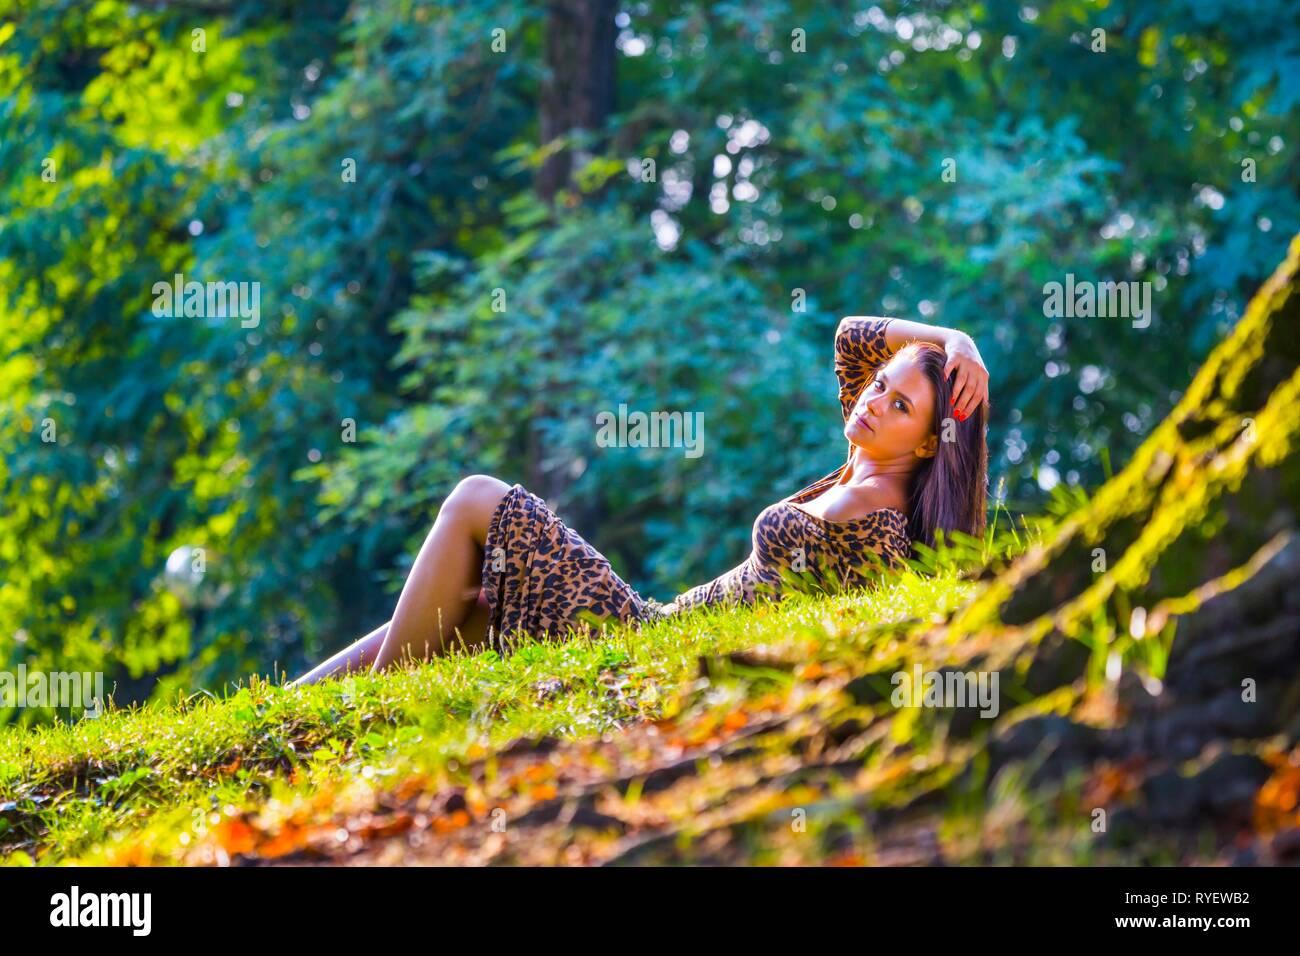 Pretty teen girl outside lying on back in nature wearing leopard-patterned dress - Stock Image